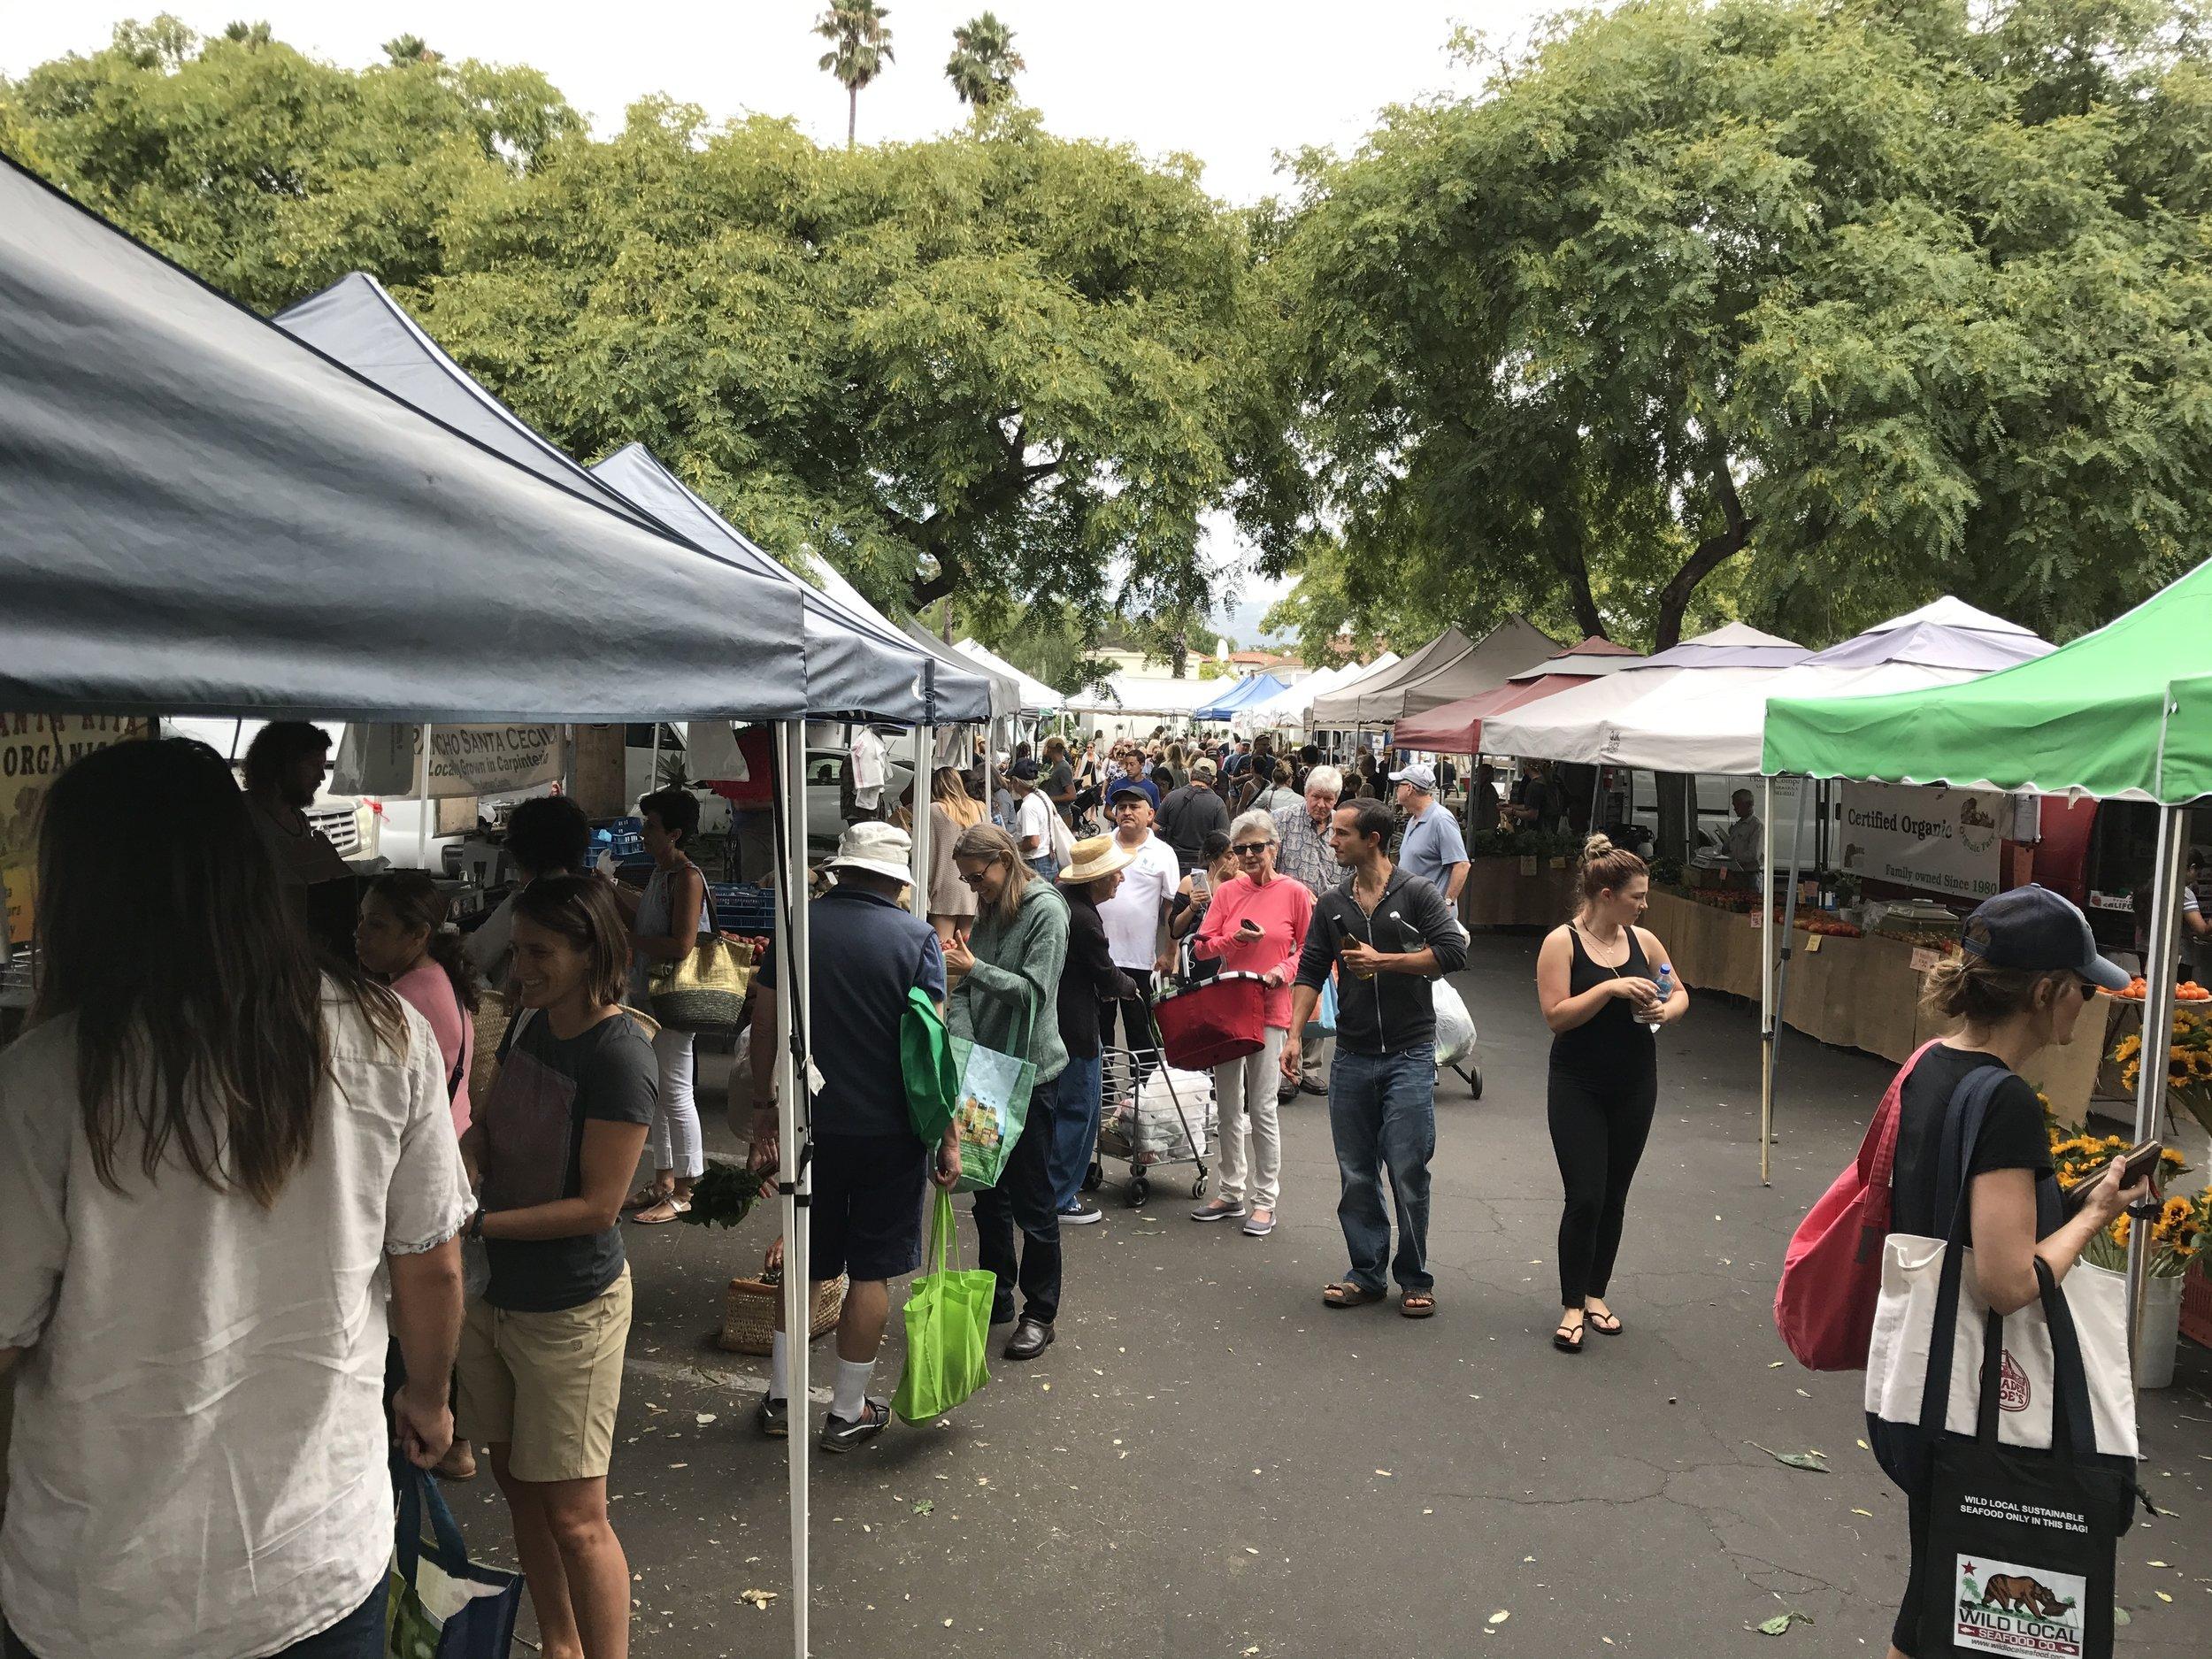 - Santa Barbara Saturday Farmers MarketJust a few blocks away, each Saturday from 8:30am-1:00pmCorner of Santa Barbara and Cota Streets